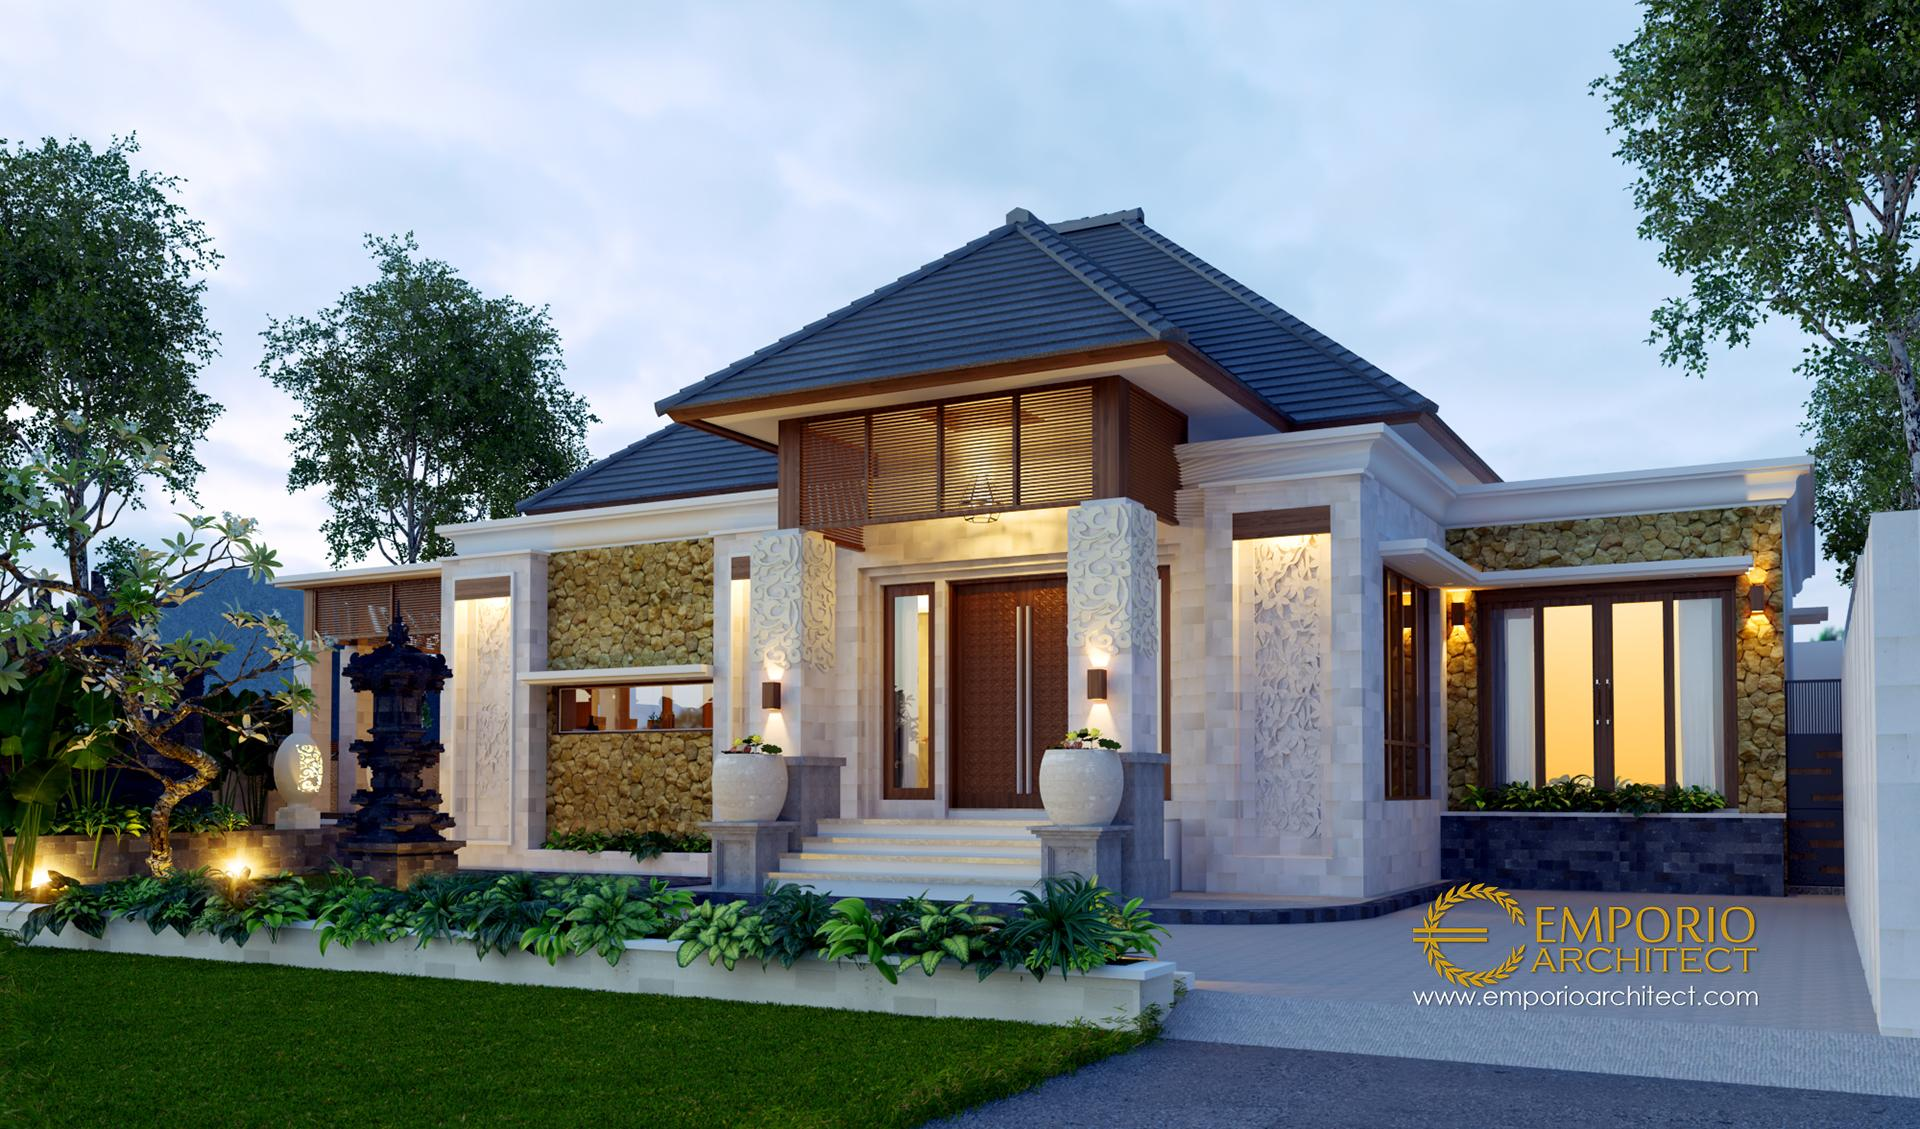 Desain Rumah Villa Bali 1 Lantai Bapak Made Di Jimbaran Badung Bali